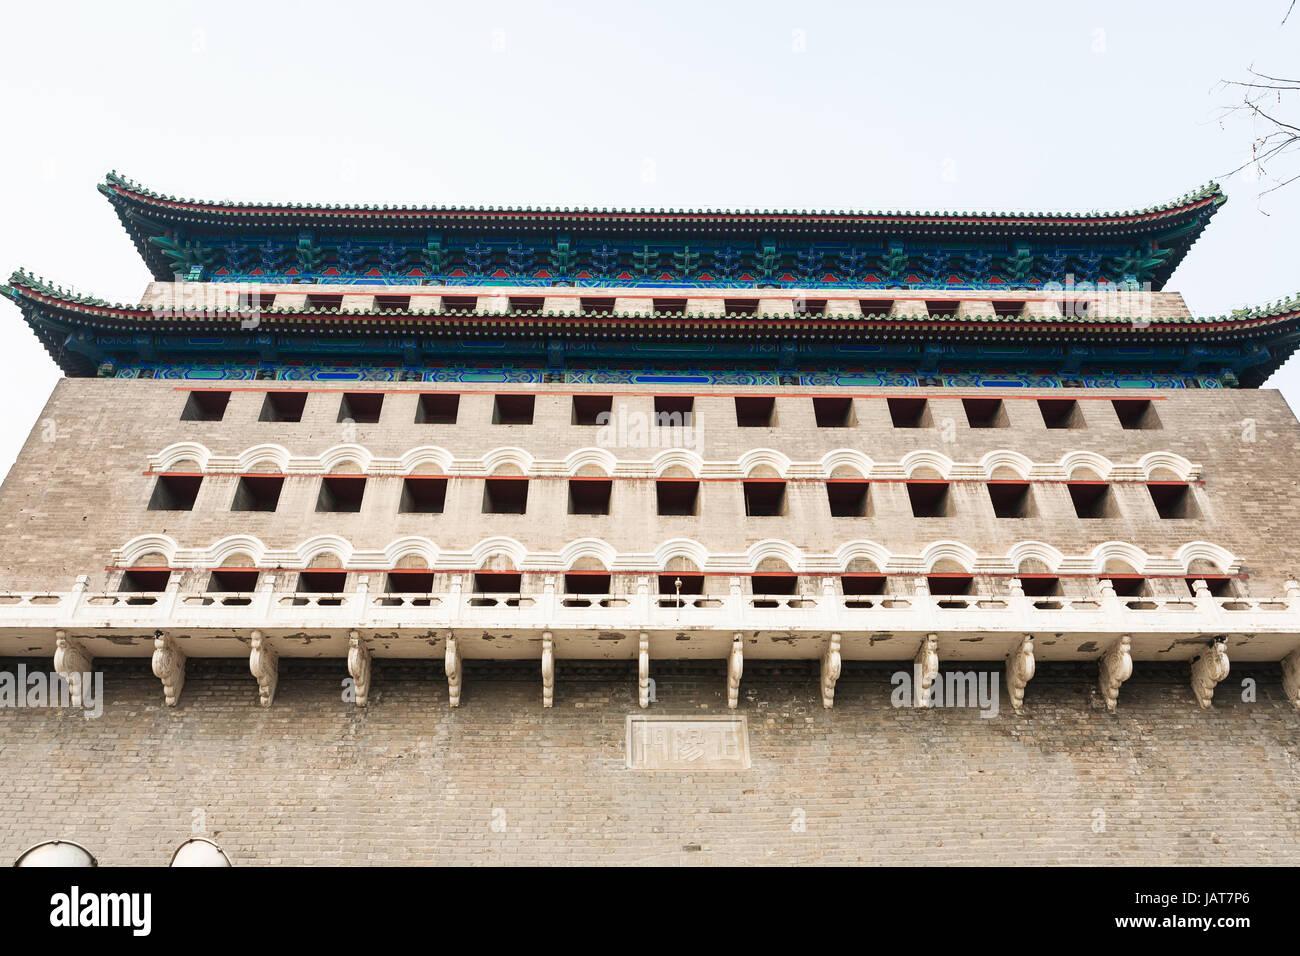 Reisen Sie nach China - Wand des Pfeil-Turm (Jian Lou, Jianlou, Zhengyangmen Gate) in Peking im Frühjahr. Der Turm Stockfoto